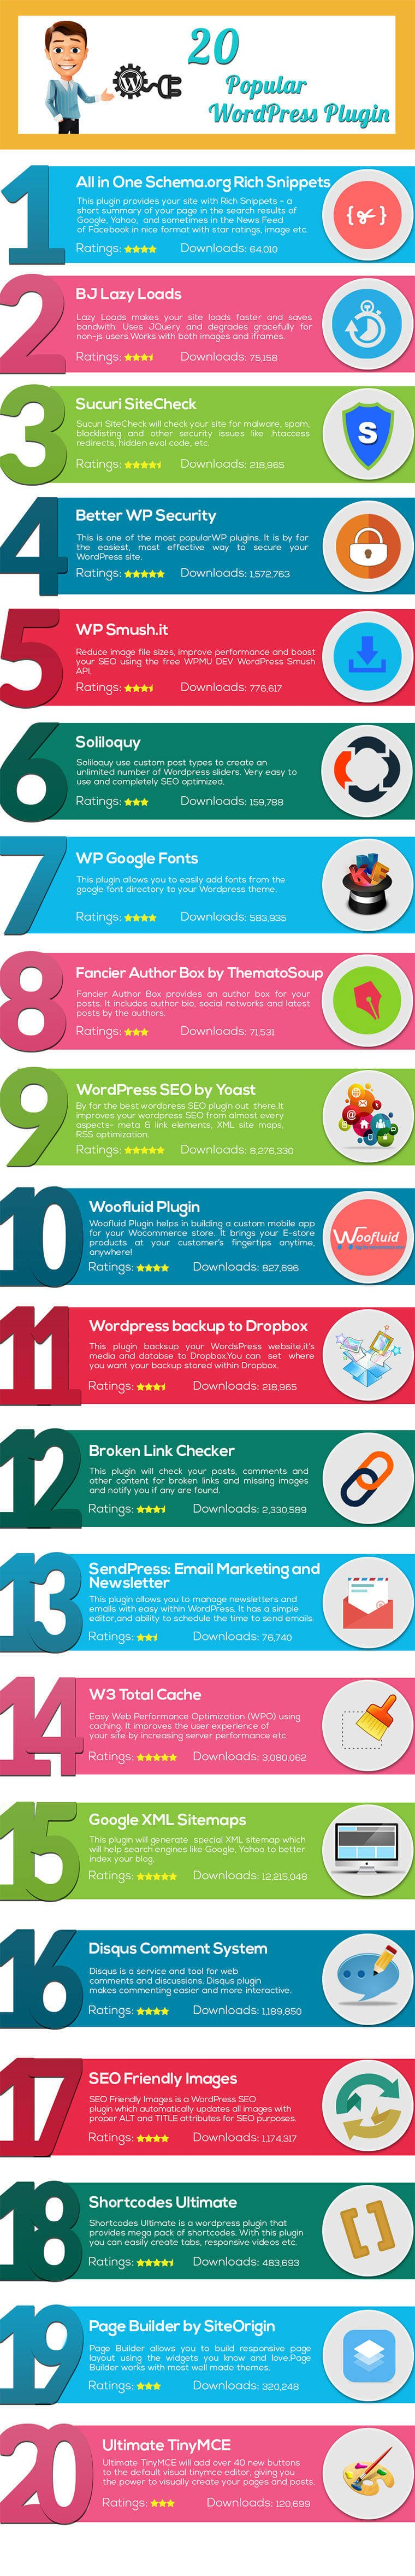 20-Popular-WordPress-Plugins